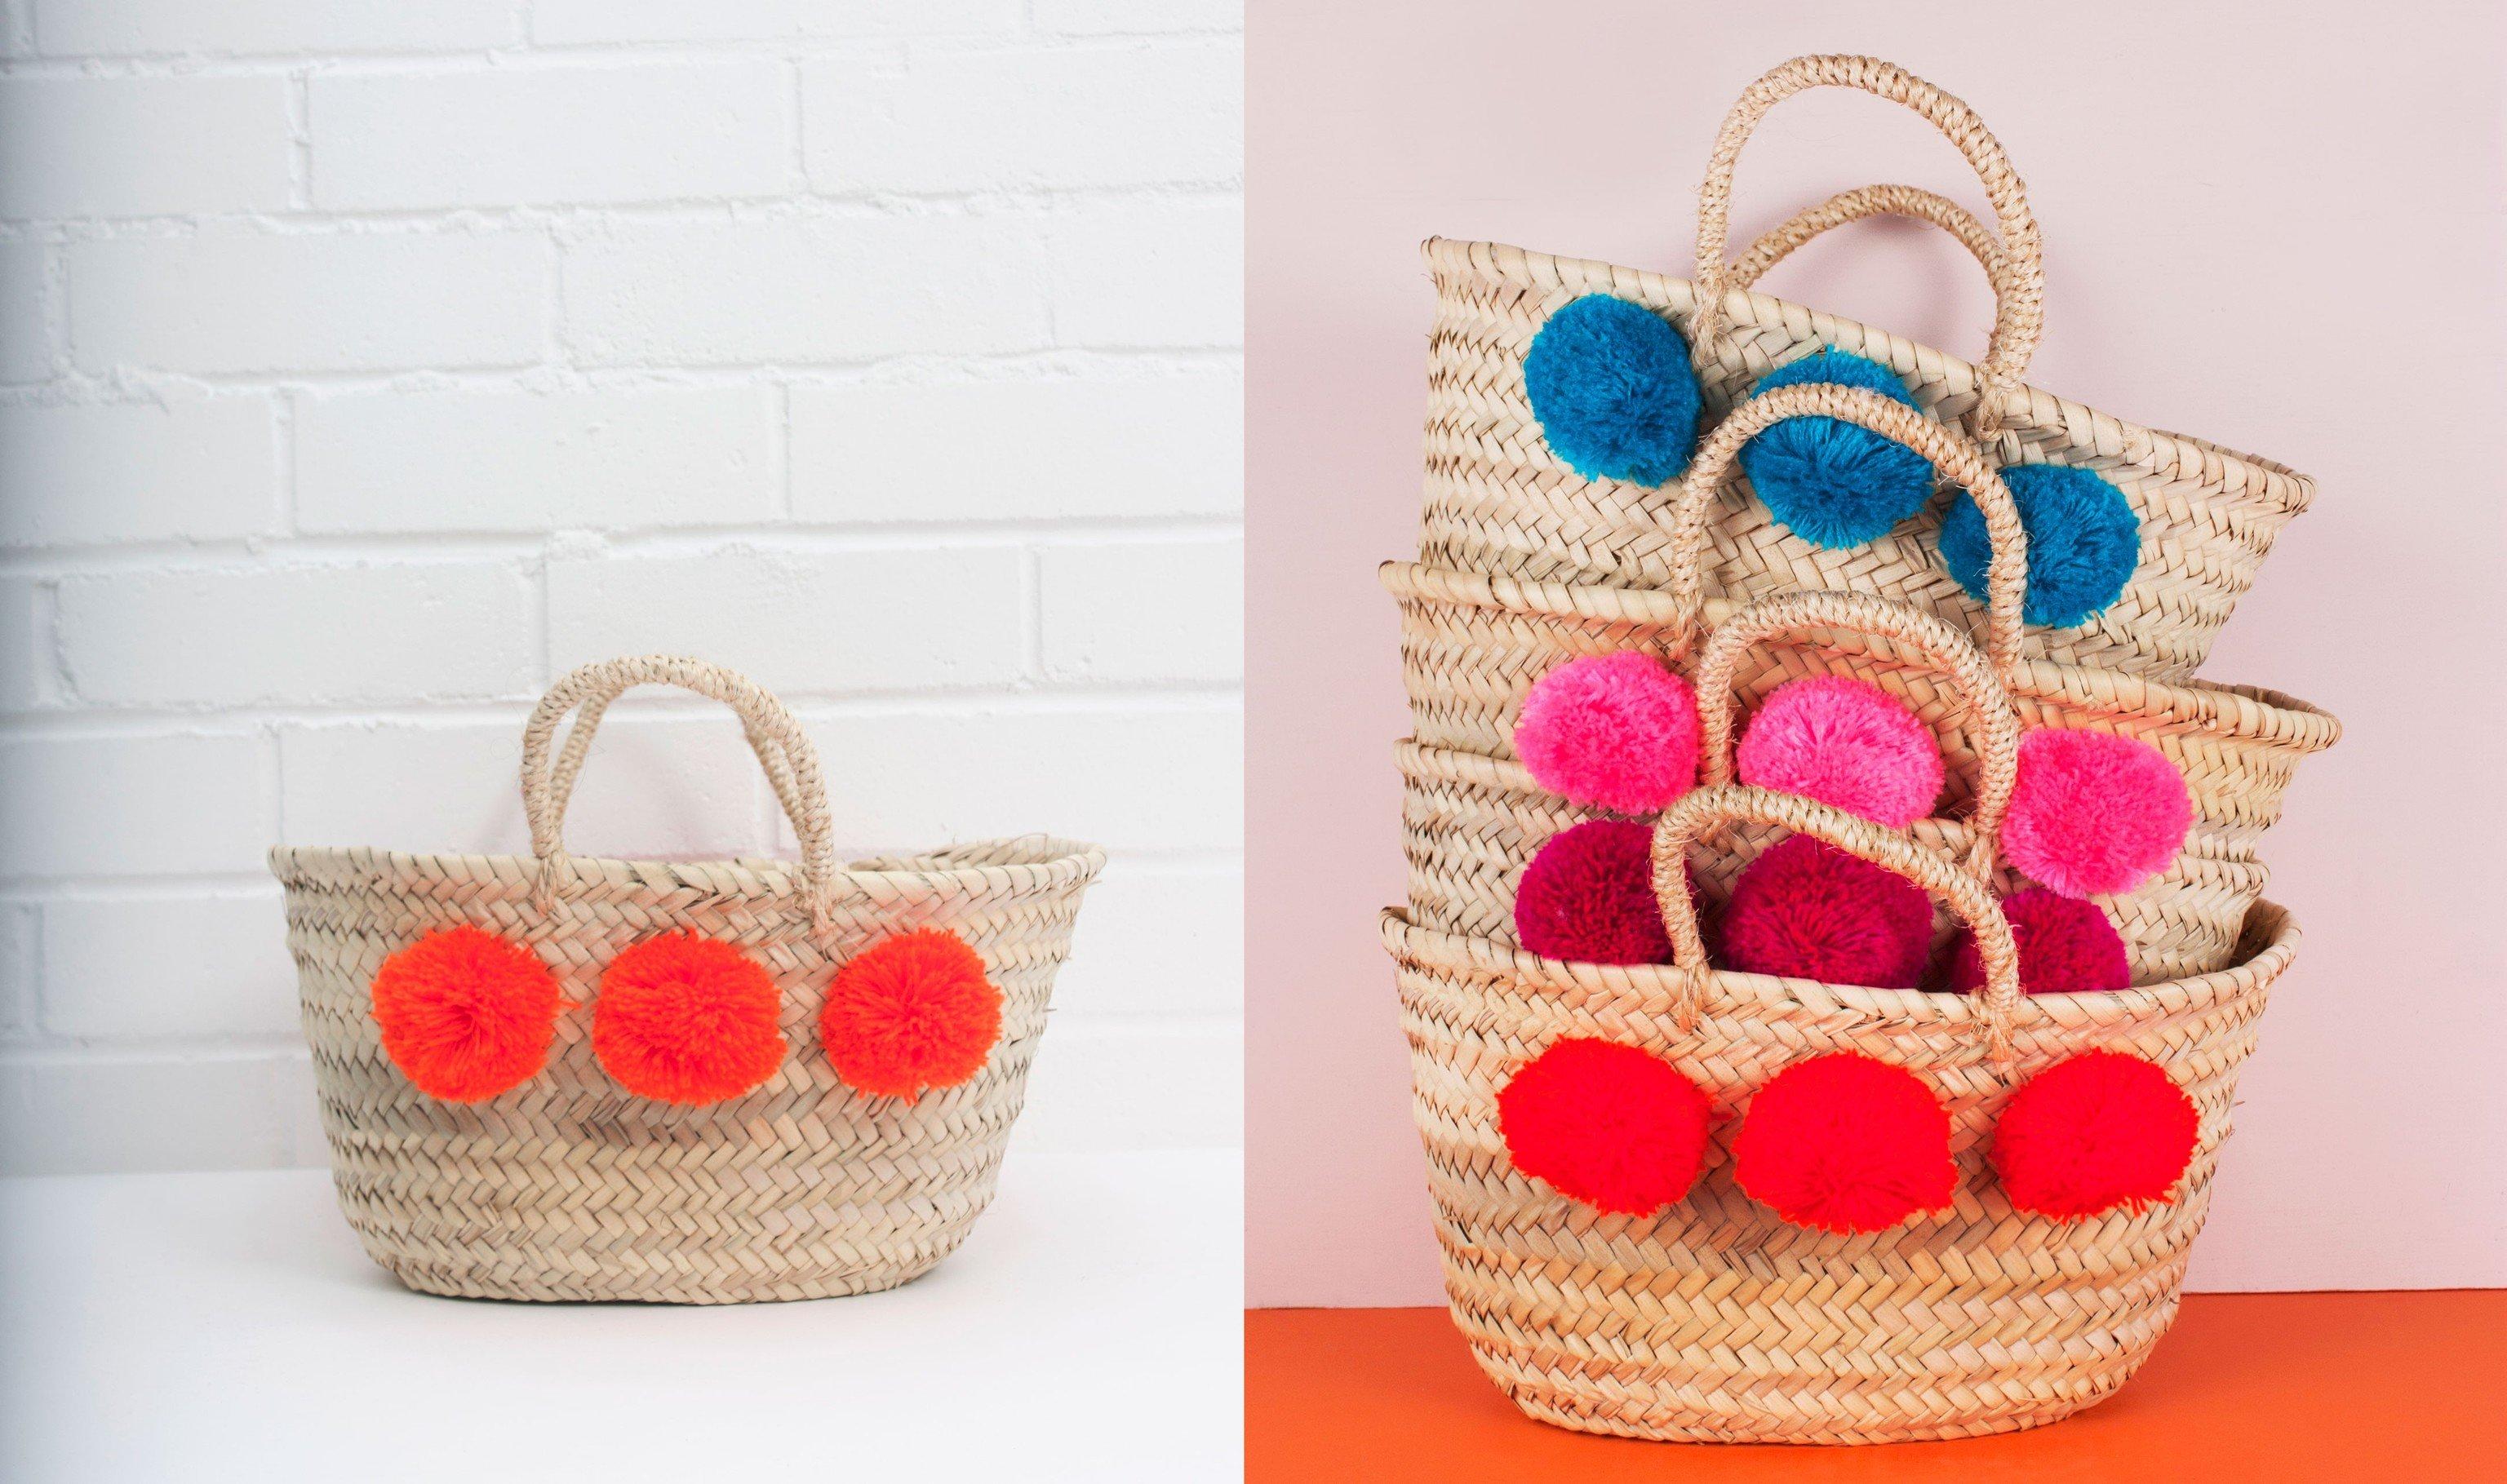 Style + Design crochet art basket footwear fashion accessory pattern handbag